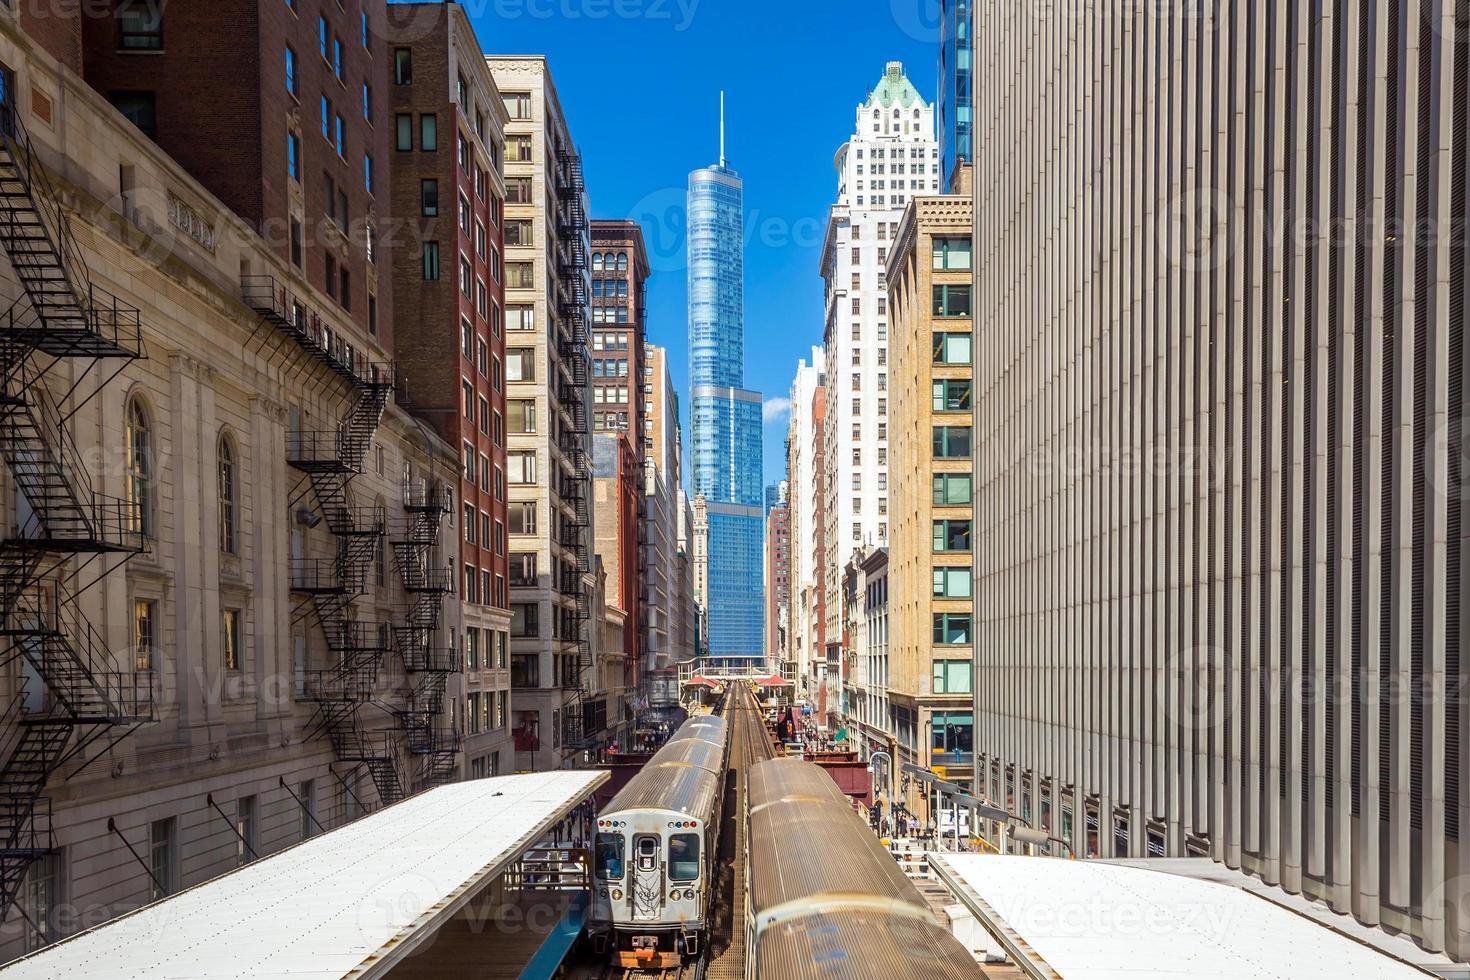 Train in downtown Chicago IL photo